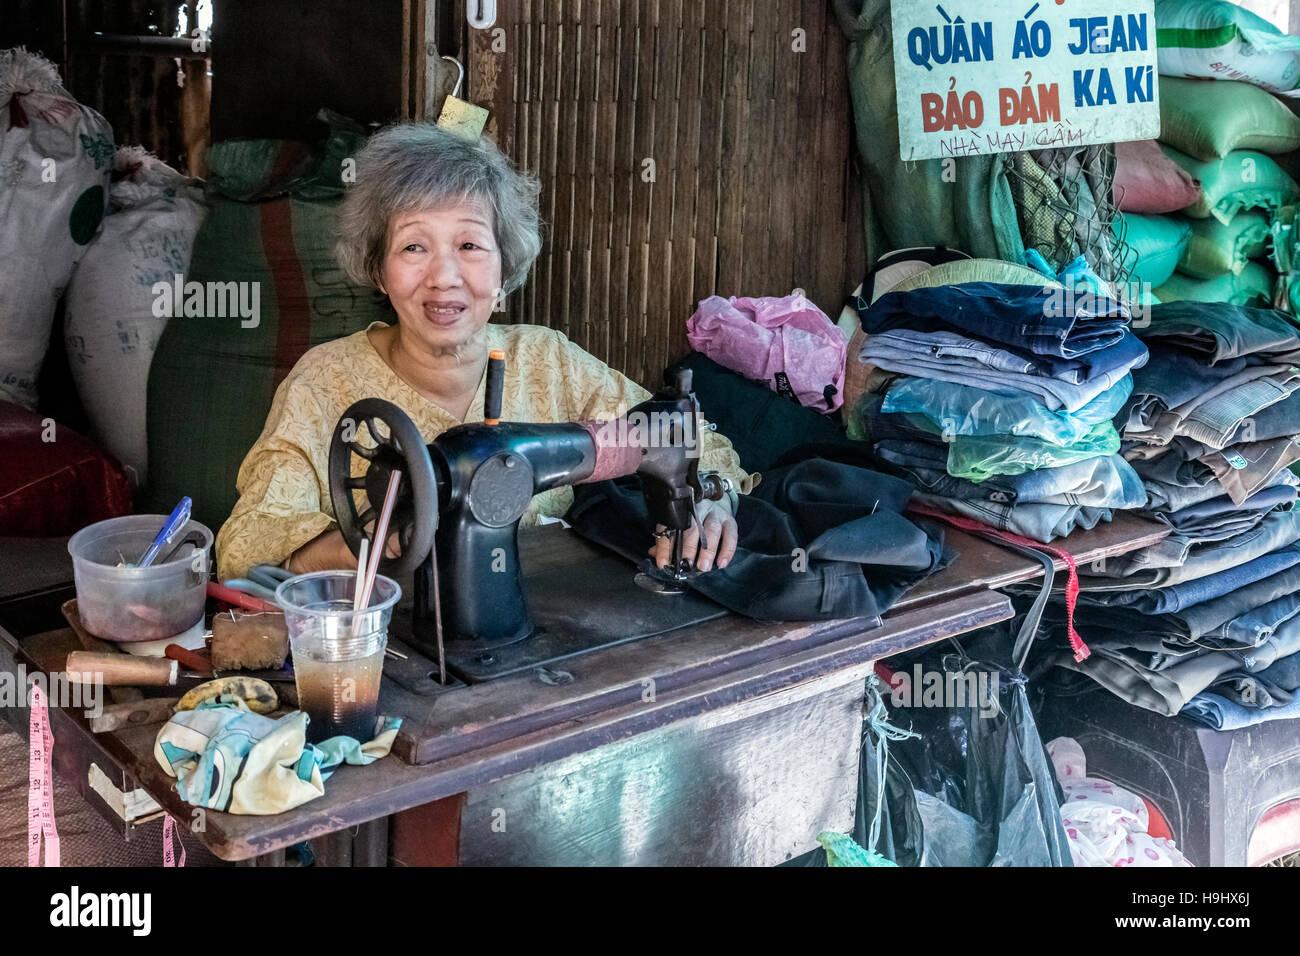 Costurera en un mercado local en Vinh Long, en el Delta del Mekong, Vietnam, Asia Imagen De Stock